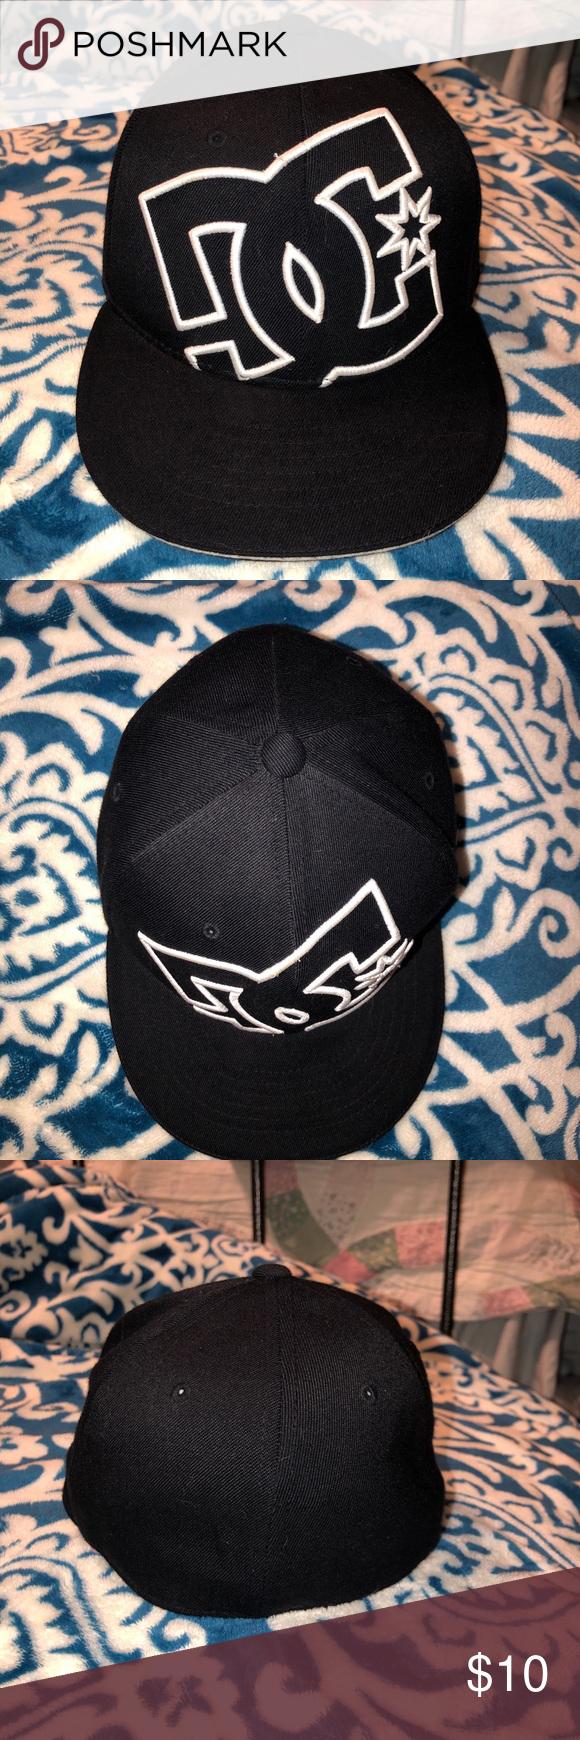 Share Your Love For Guacamole With A Custom Avocado Hat From Lids Custom Zone Custom Hats Hats Snapback Hats